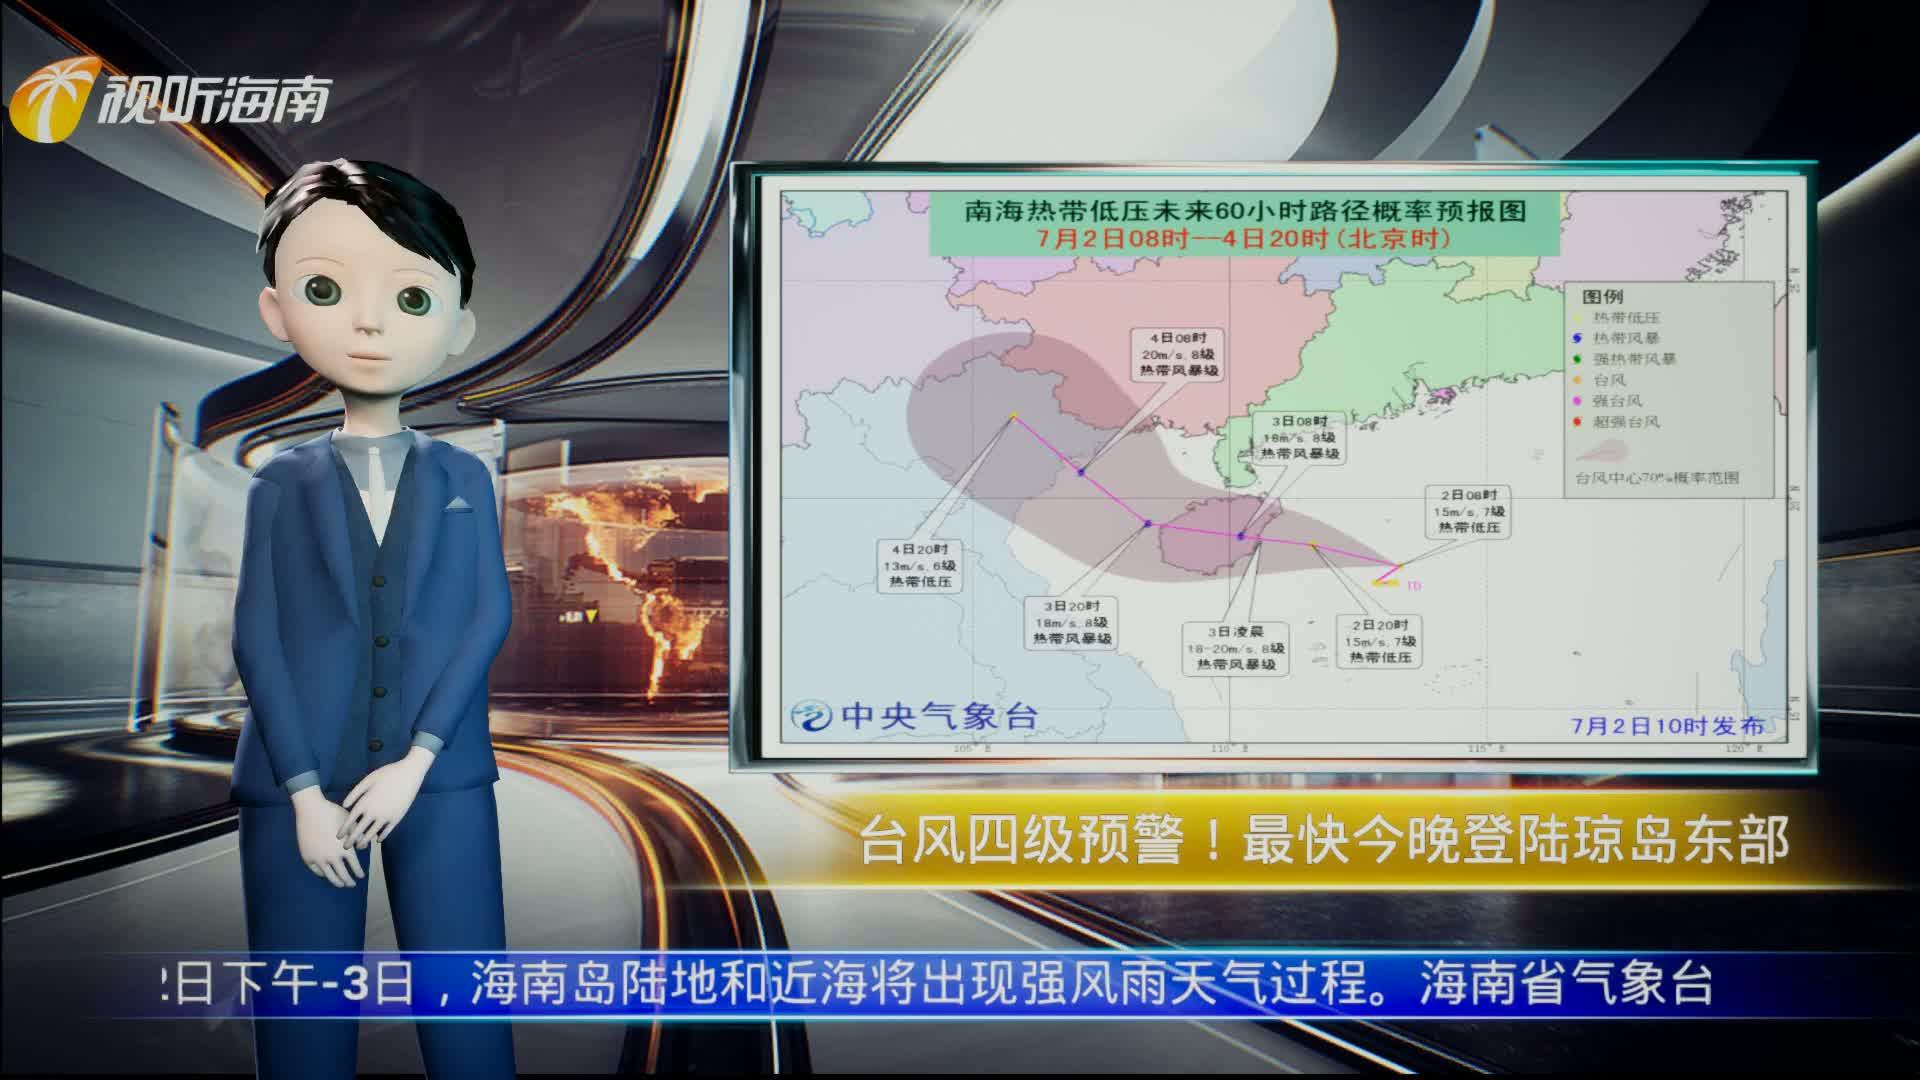 AI主播首秀:臺風預計3日凌晨在海南東部沿海地區登陸